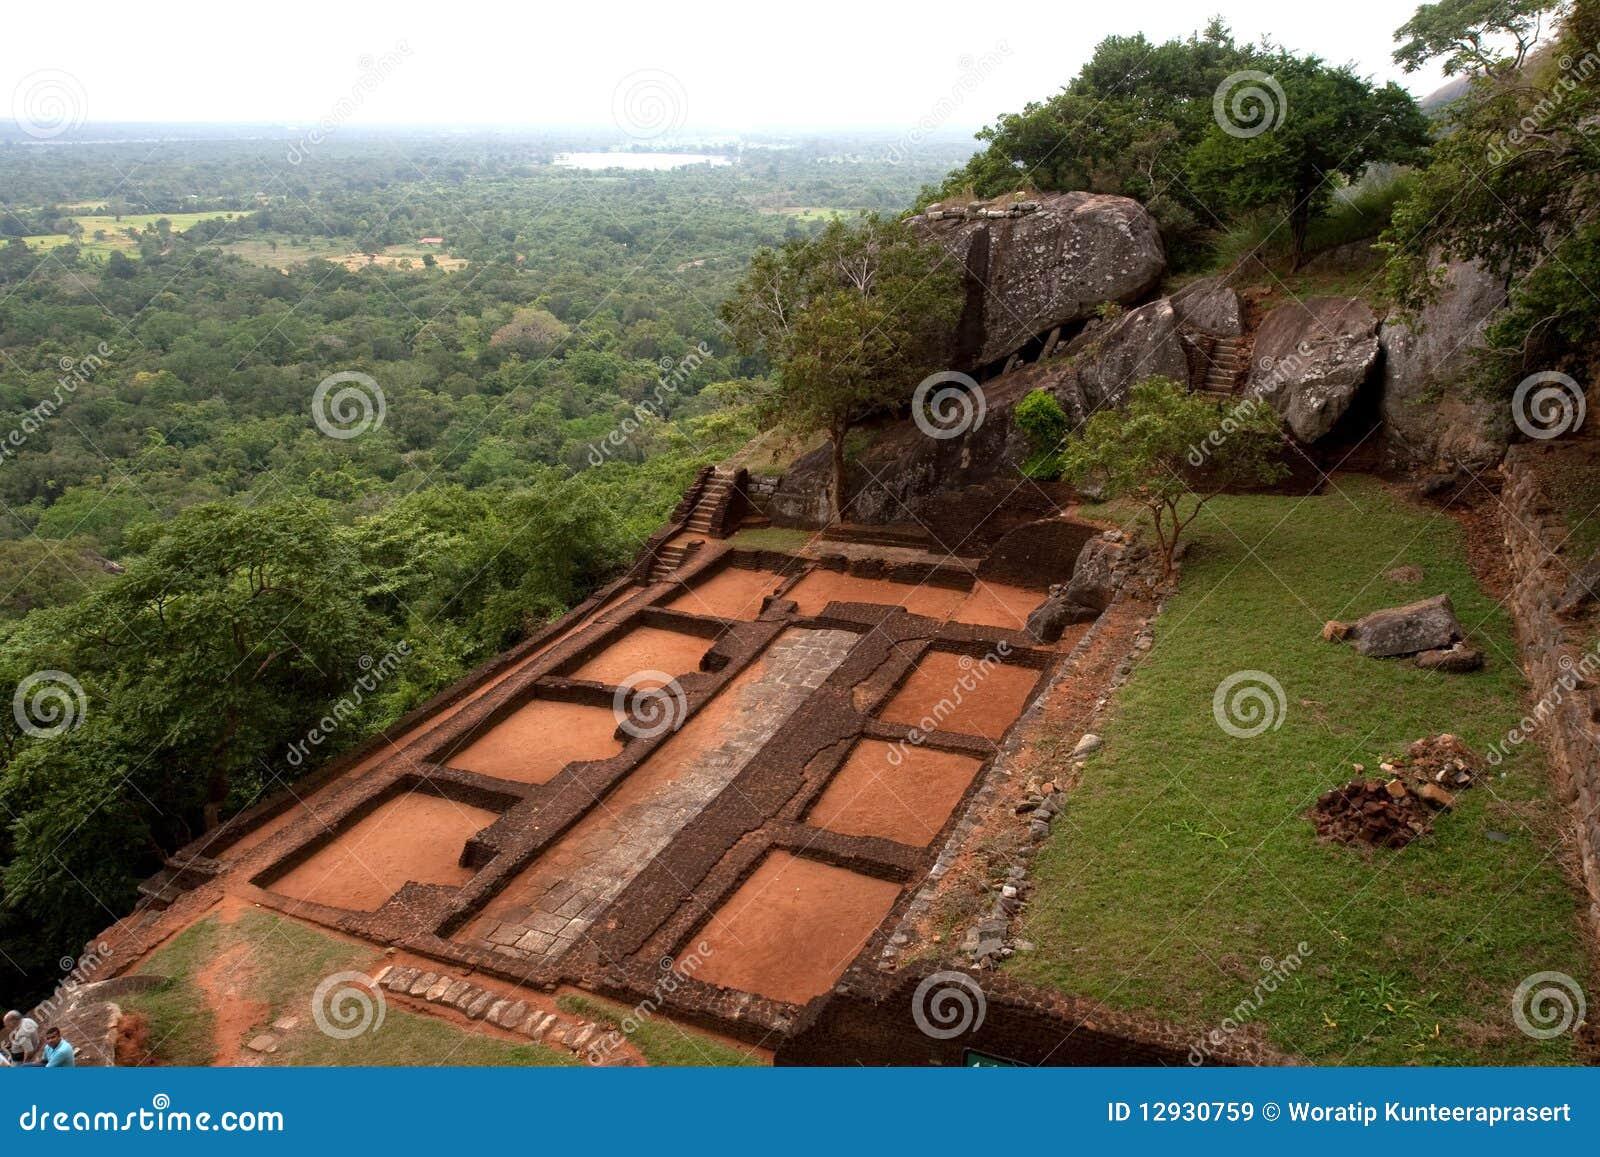 Sigiriya Lions Rock In Sri Lanka Royalty Free Stock